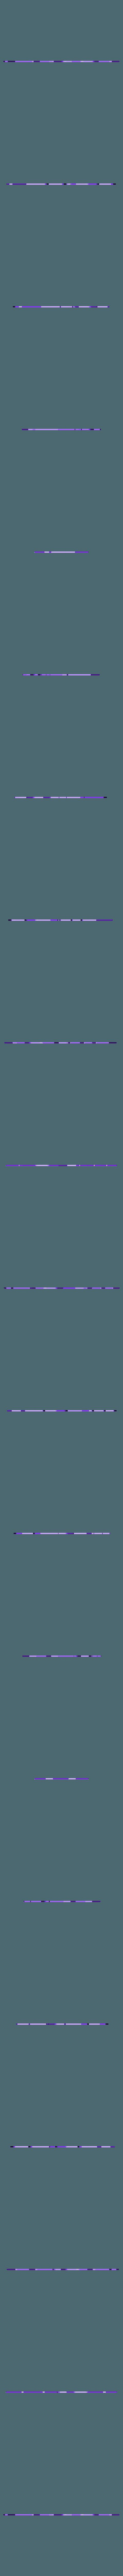 03-logo_front.STL Download STL file AC/DC led lamp #3dprintRocks • 3D printing model, irunea3dprint